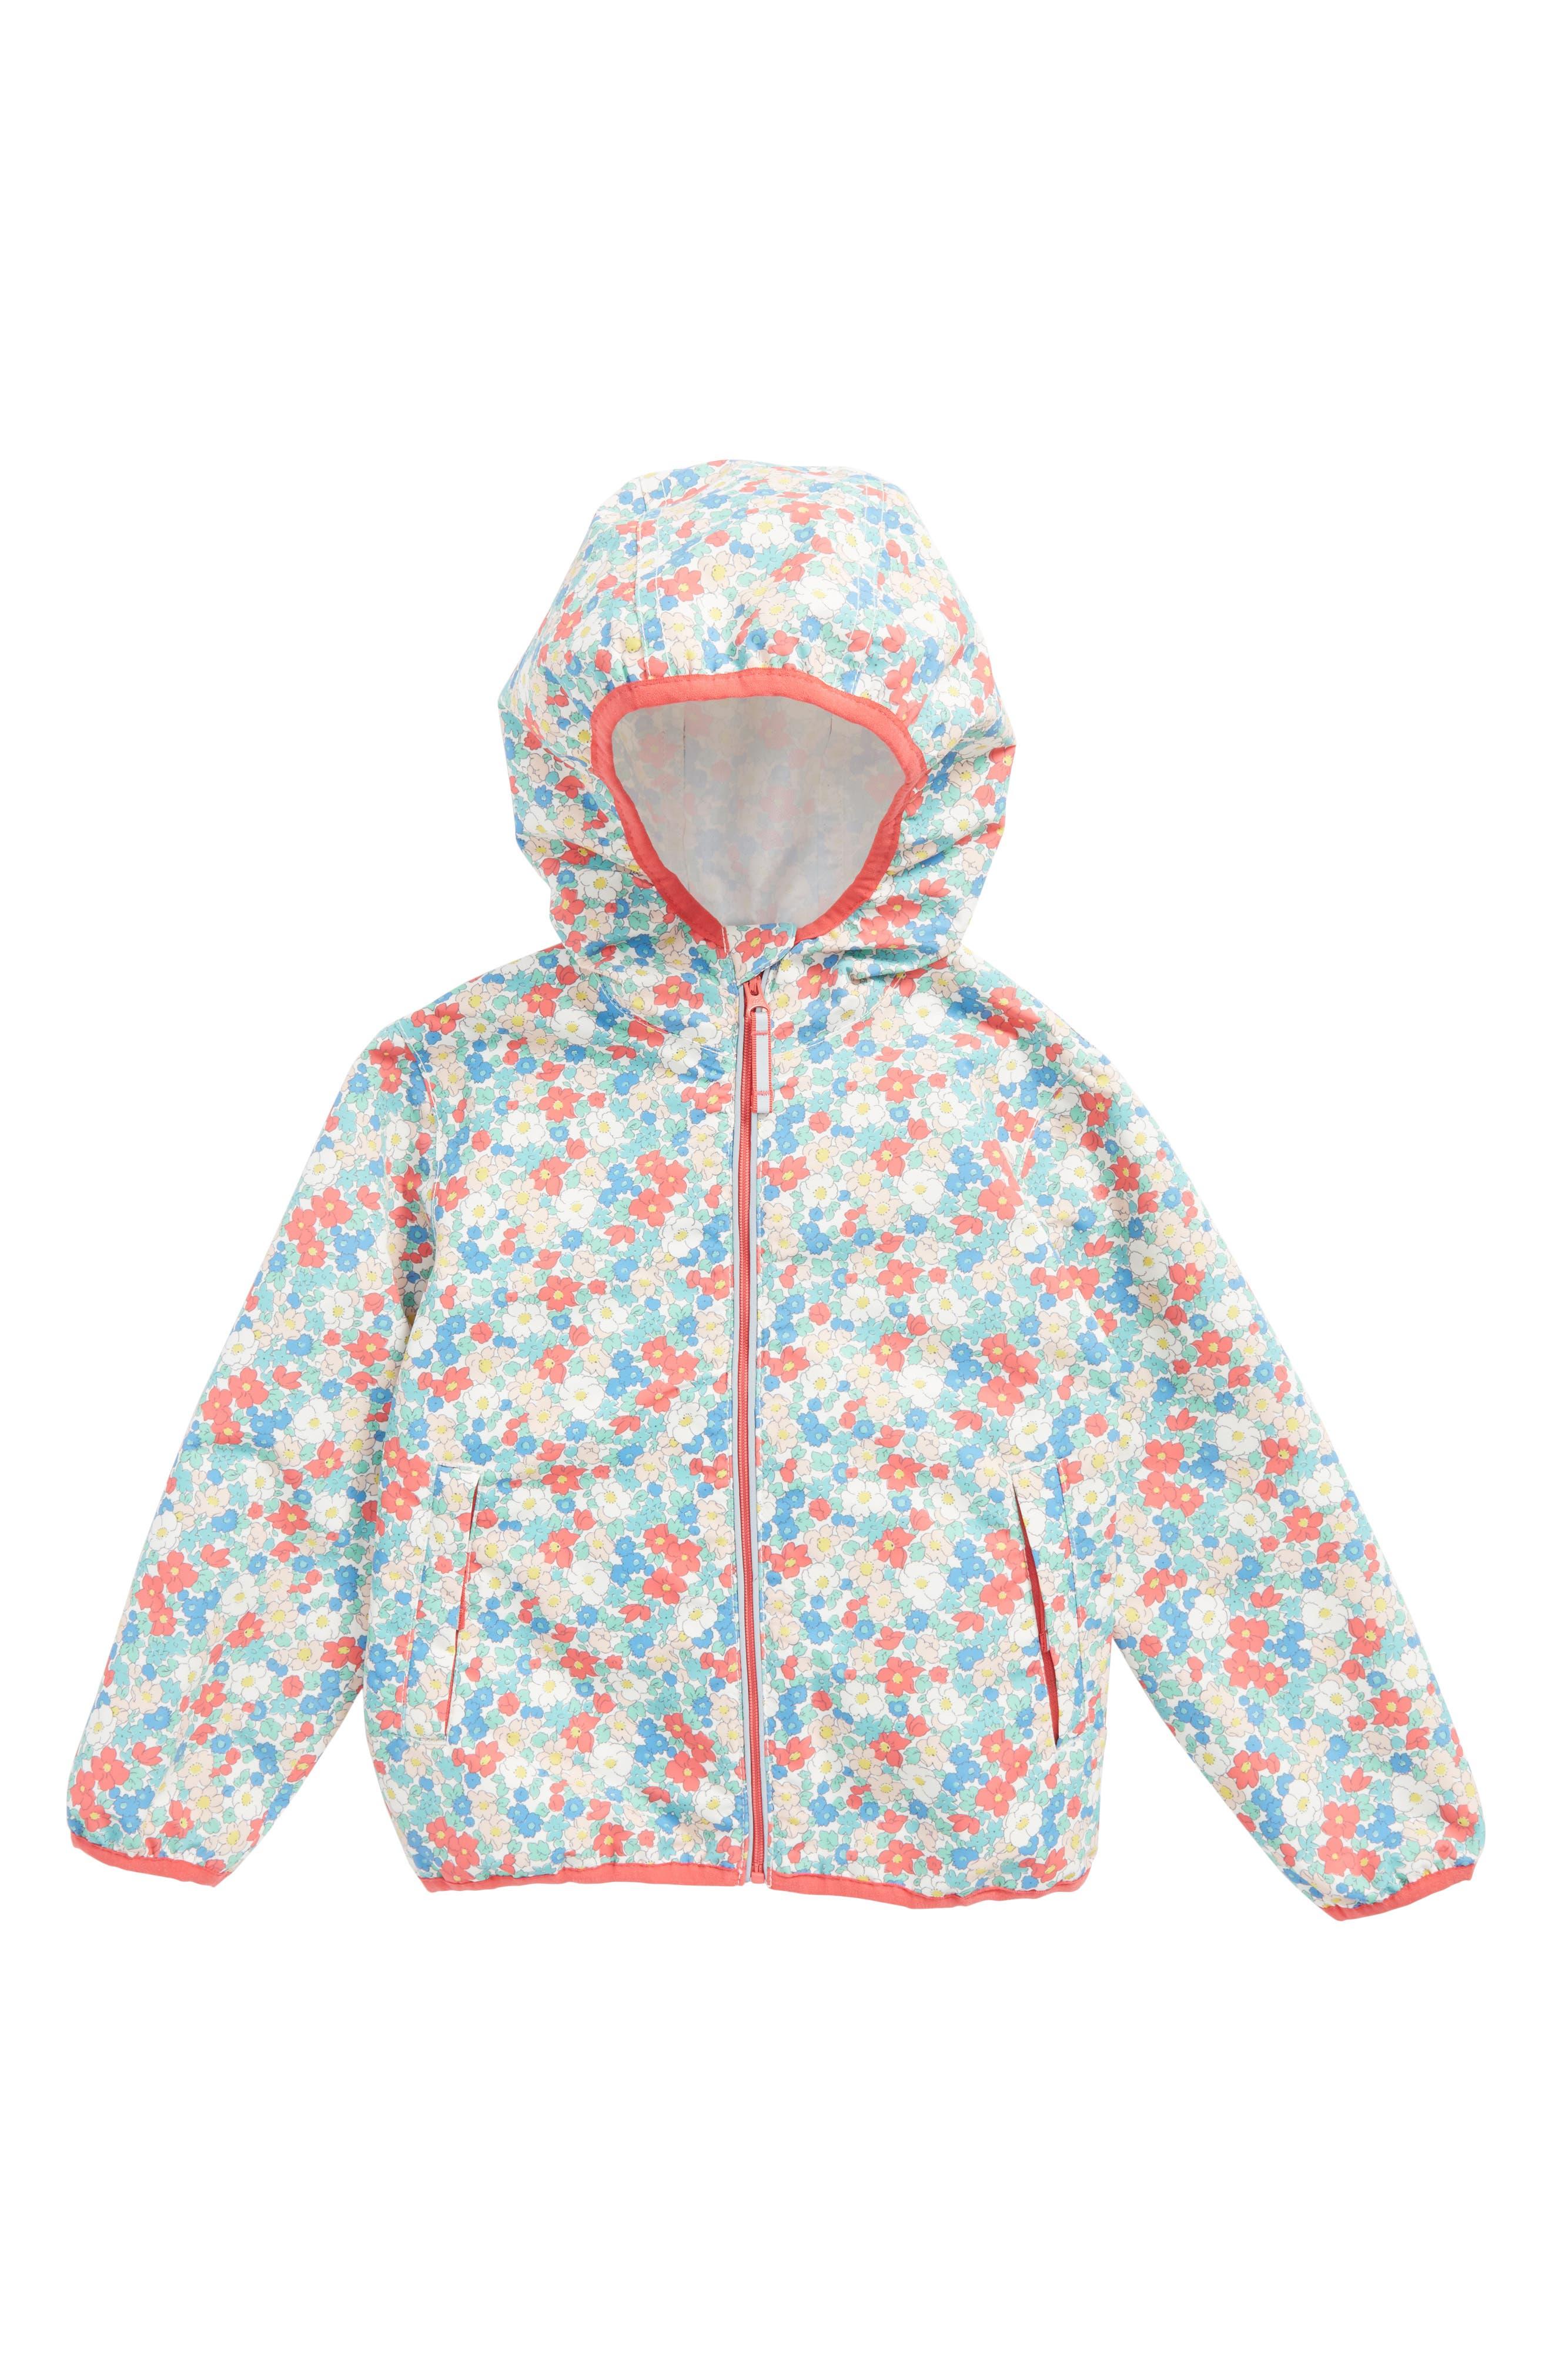 Packaway Waterproof Jacket,                             Main thumbnail 1, color,                             Strawberry Pink Floral